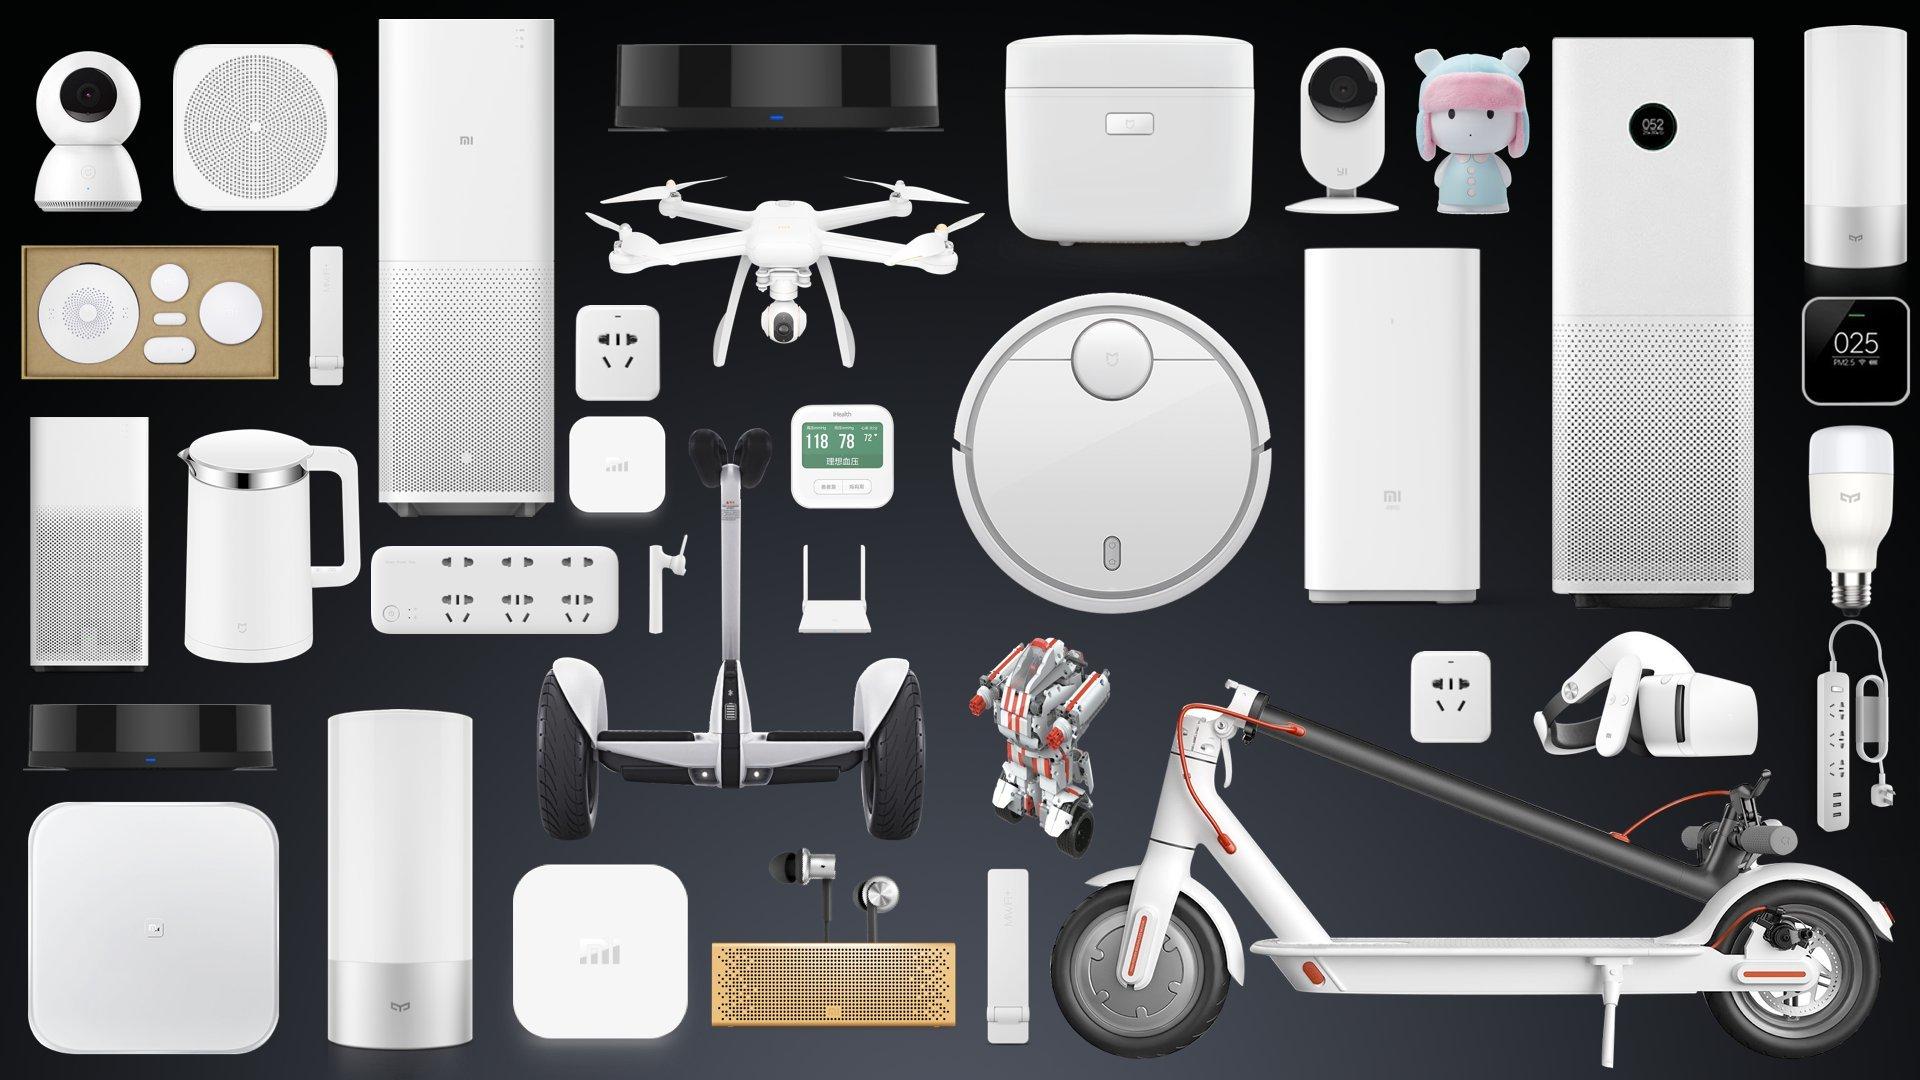 xiaomi tillbehör gadget ekosystem